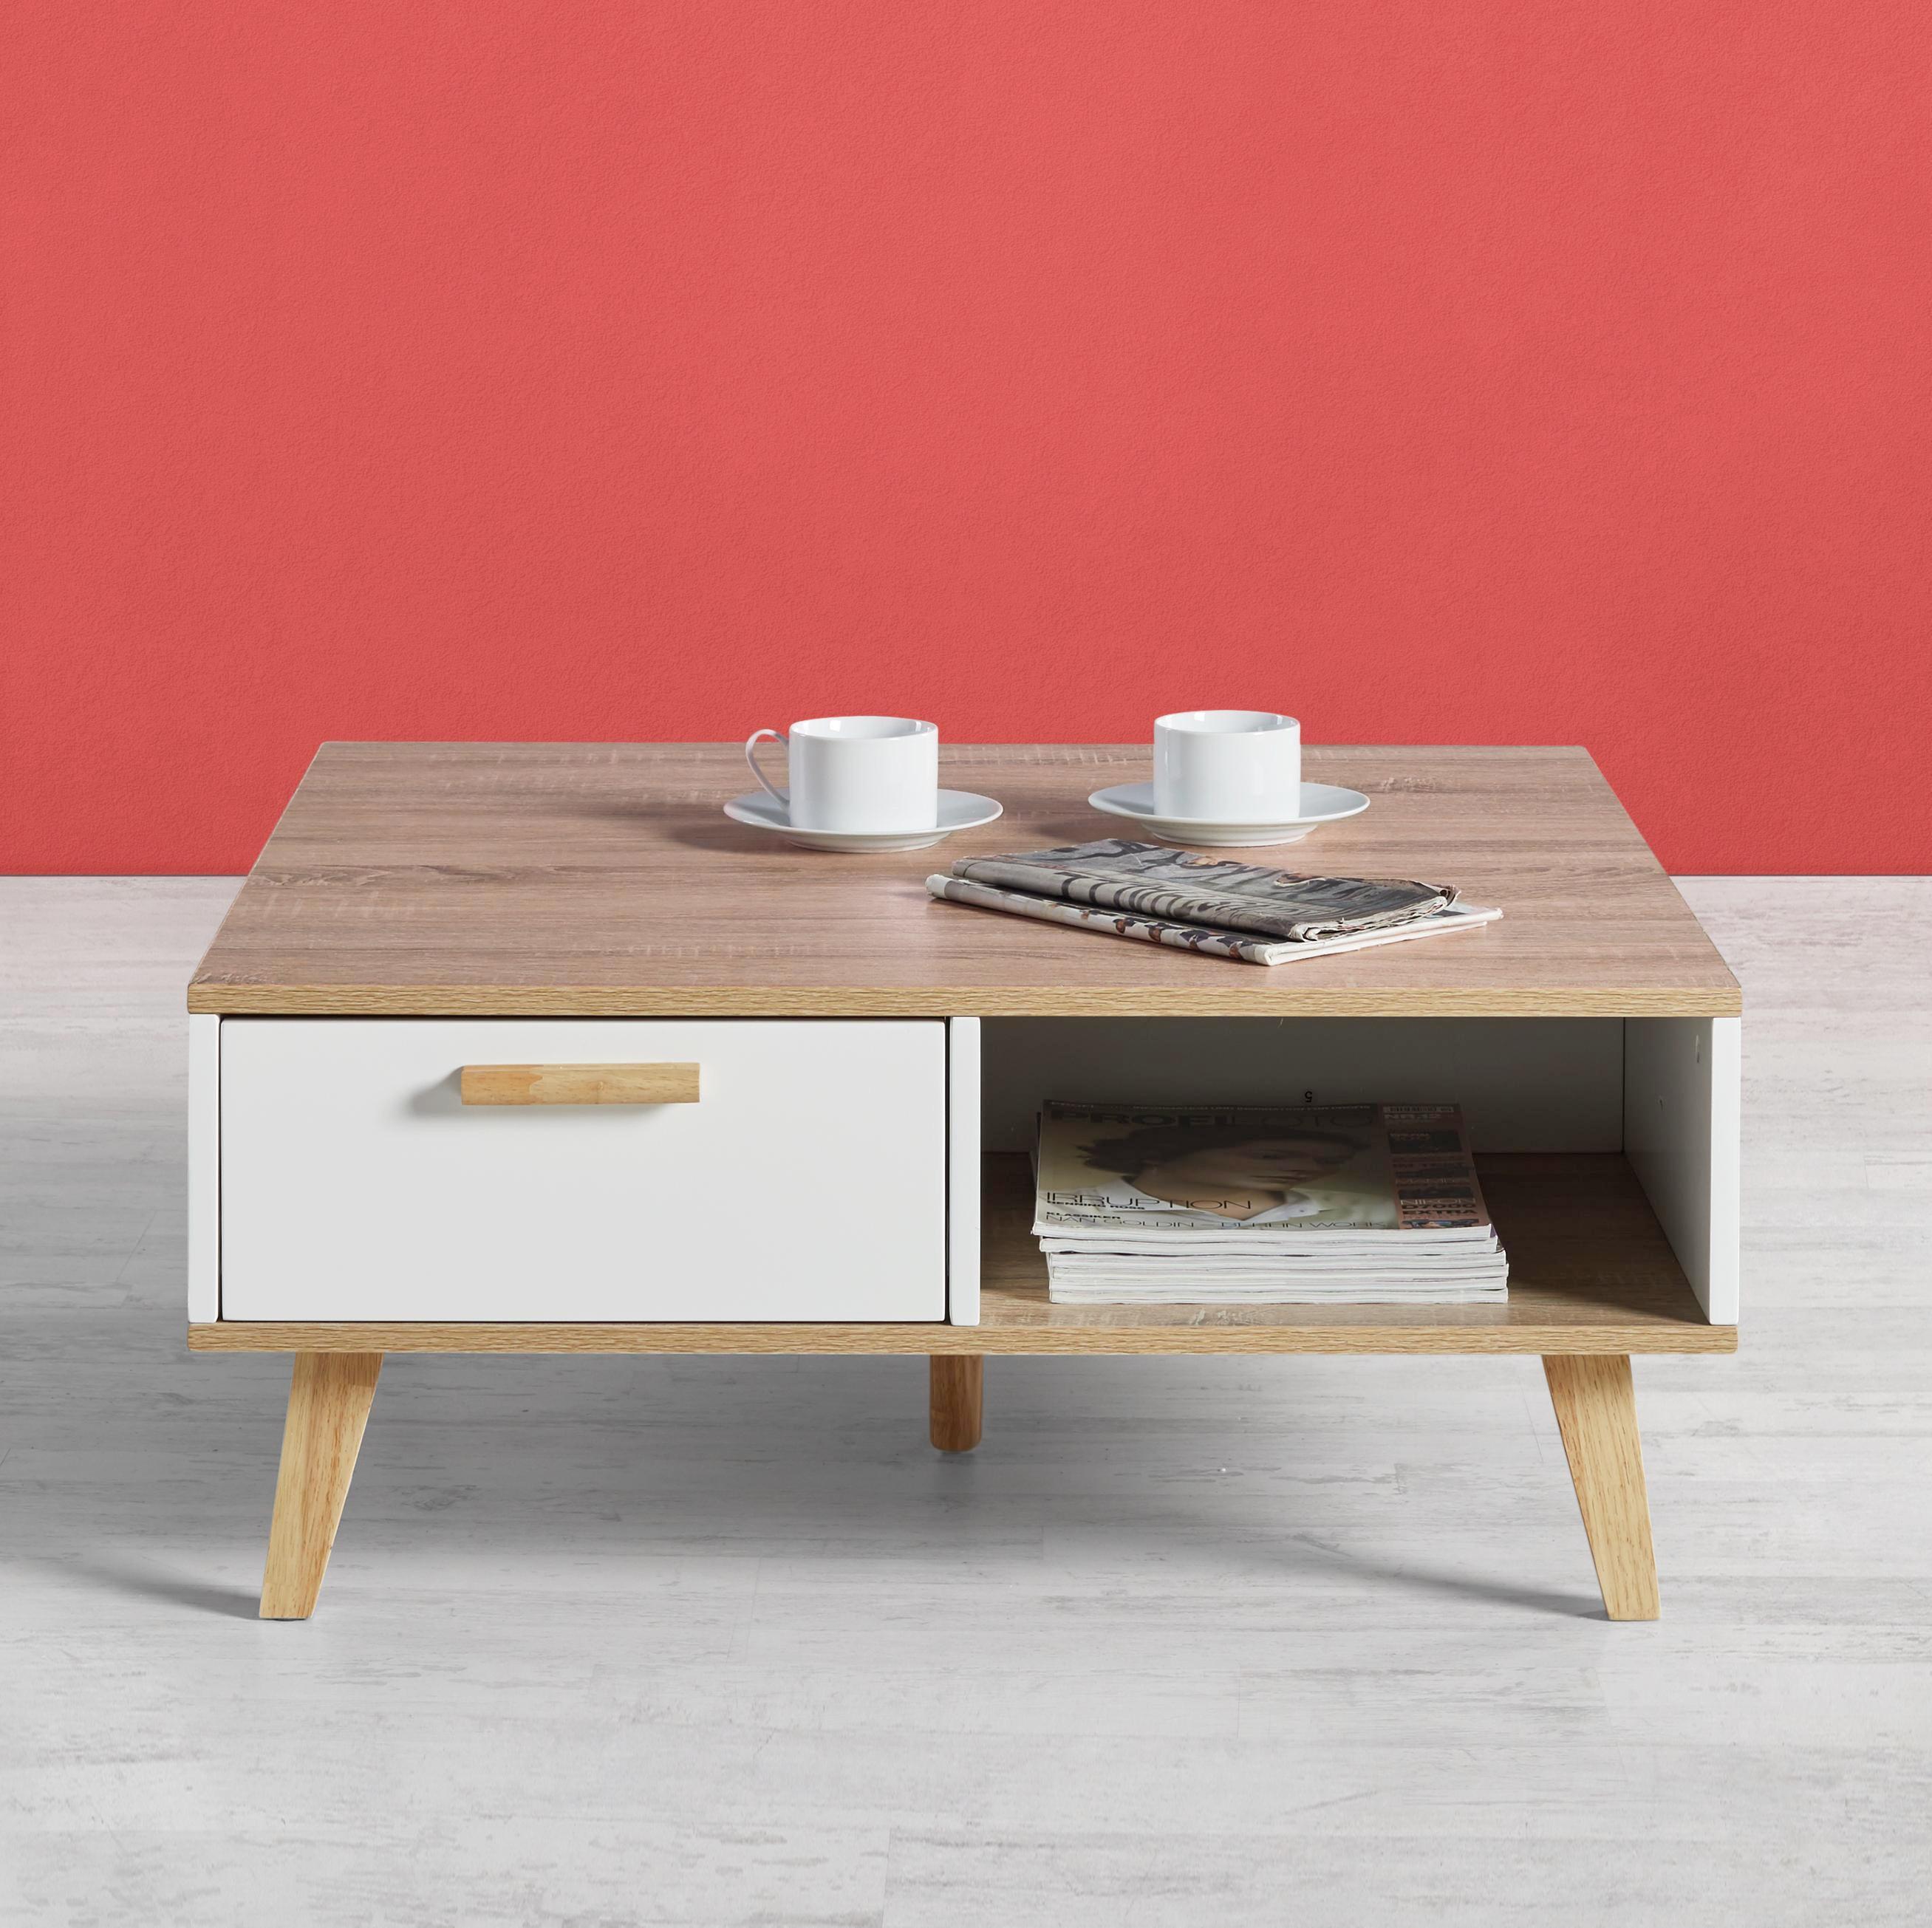 Couchtisch Claire Xcm Modern Holz.